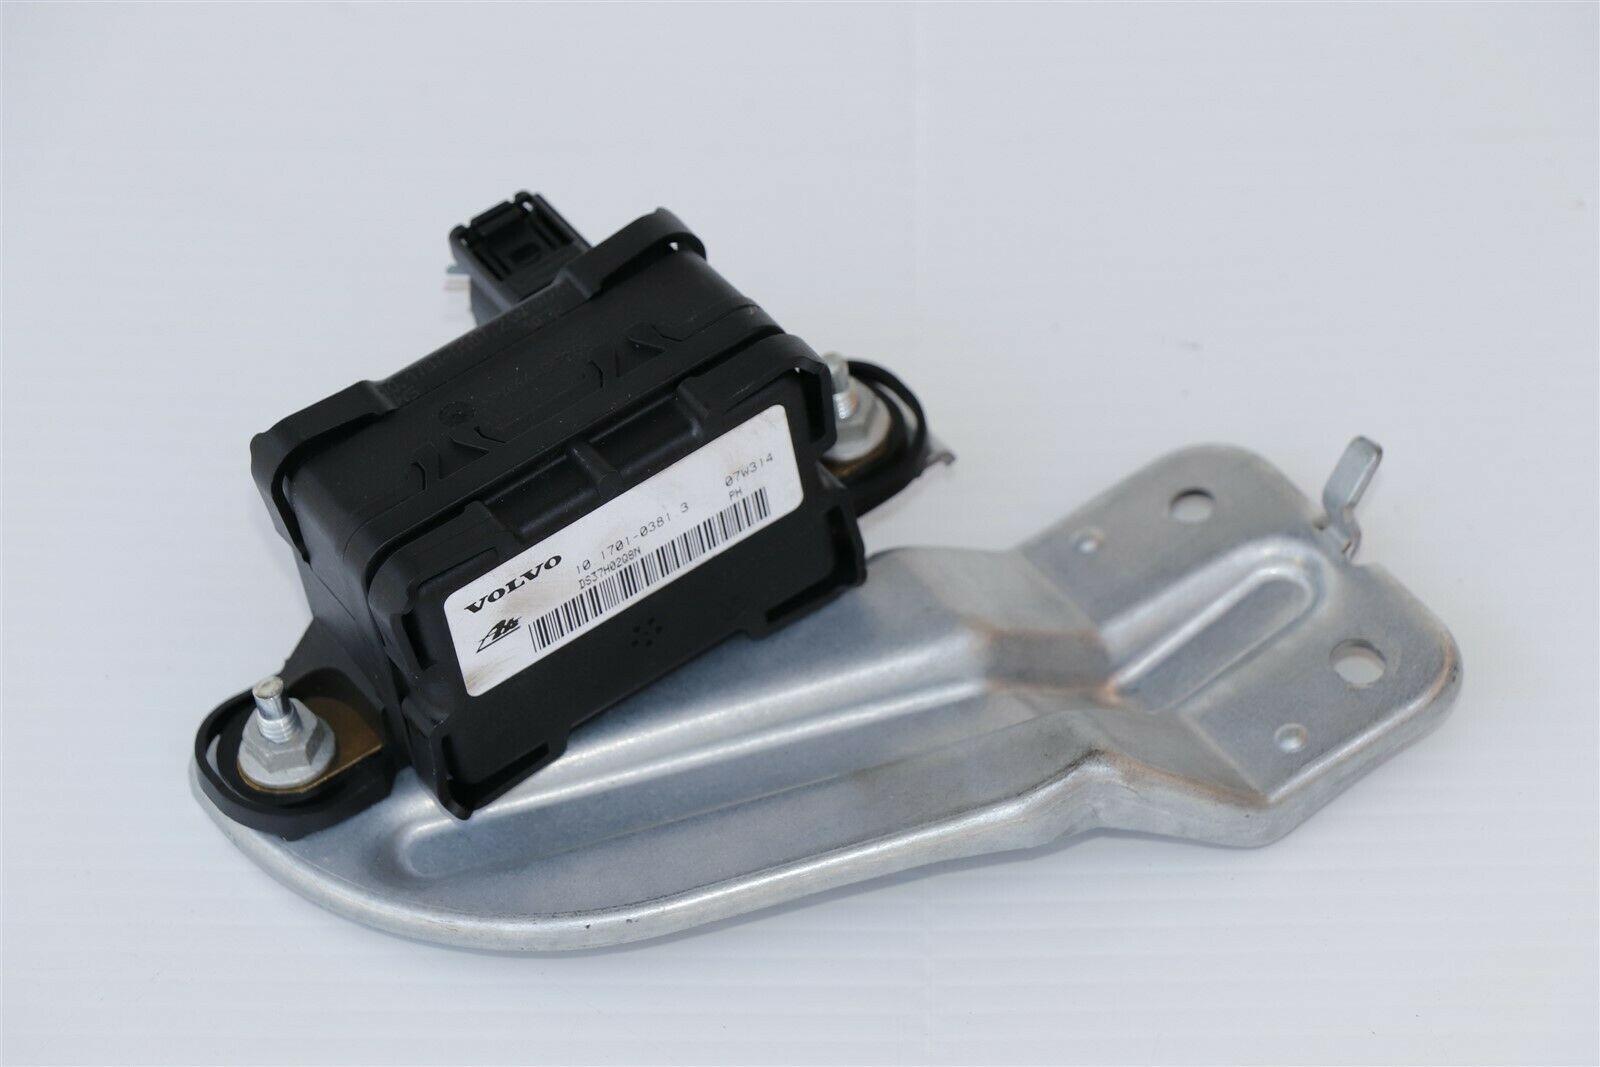 Volvo XC90 XC 90 Yaw Rate Sensor ABS Traction Control Module 30795302